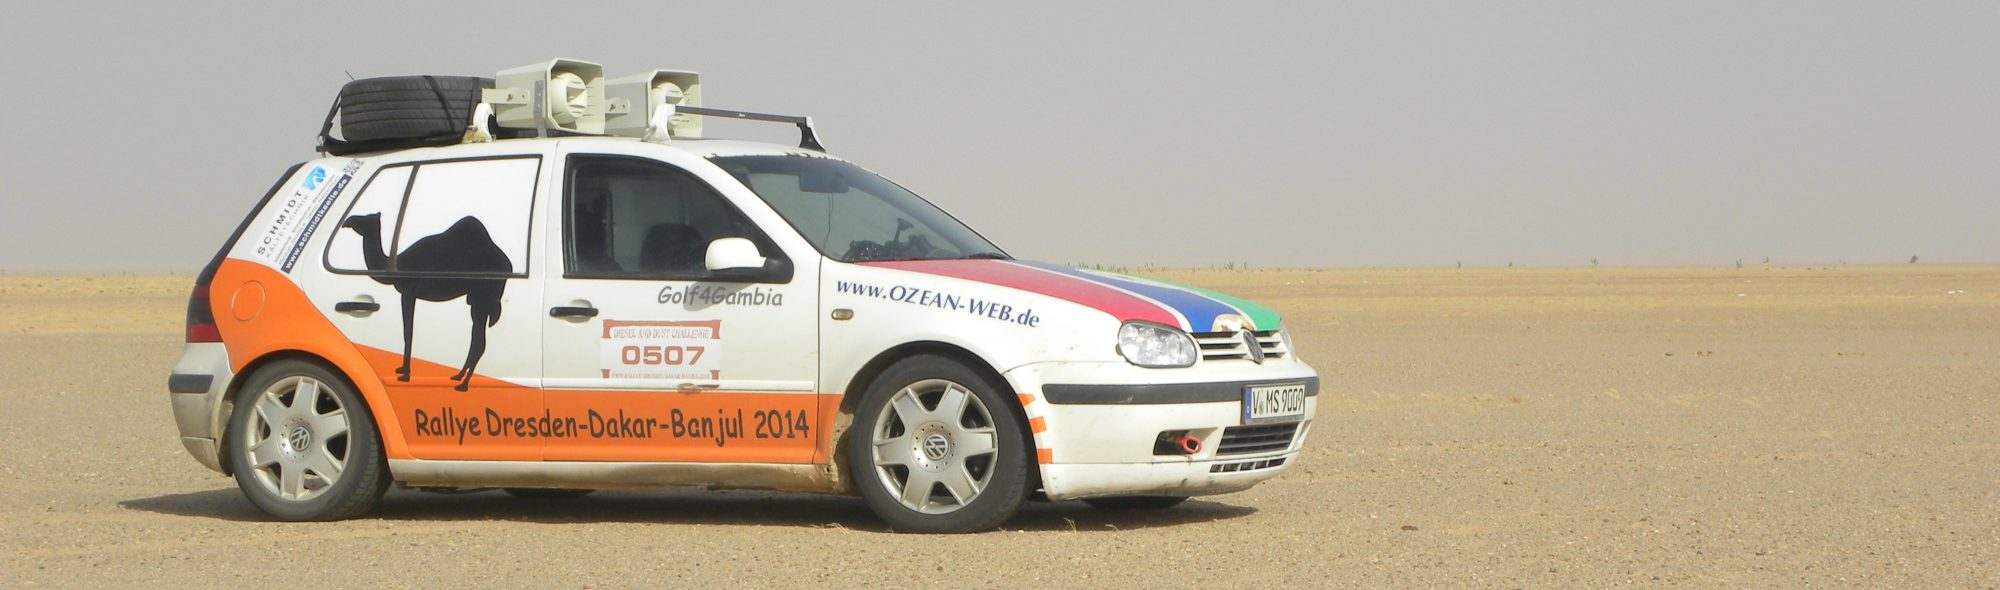 Golf4Gambia 2 / Rallye Dresden – Dakar – Banjul 2019